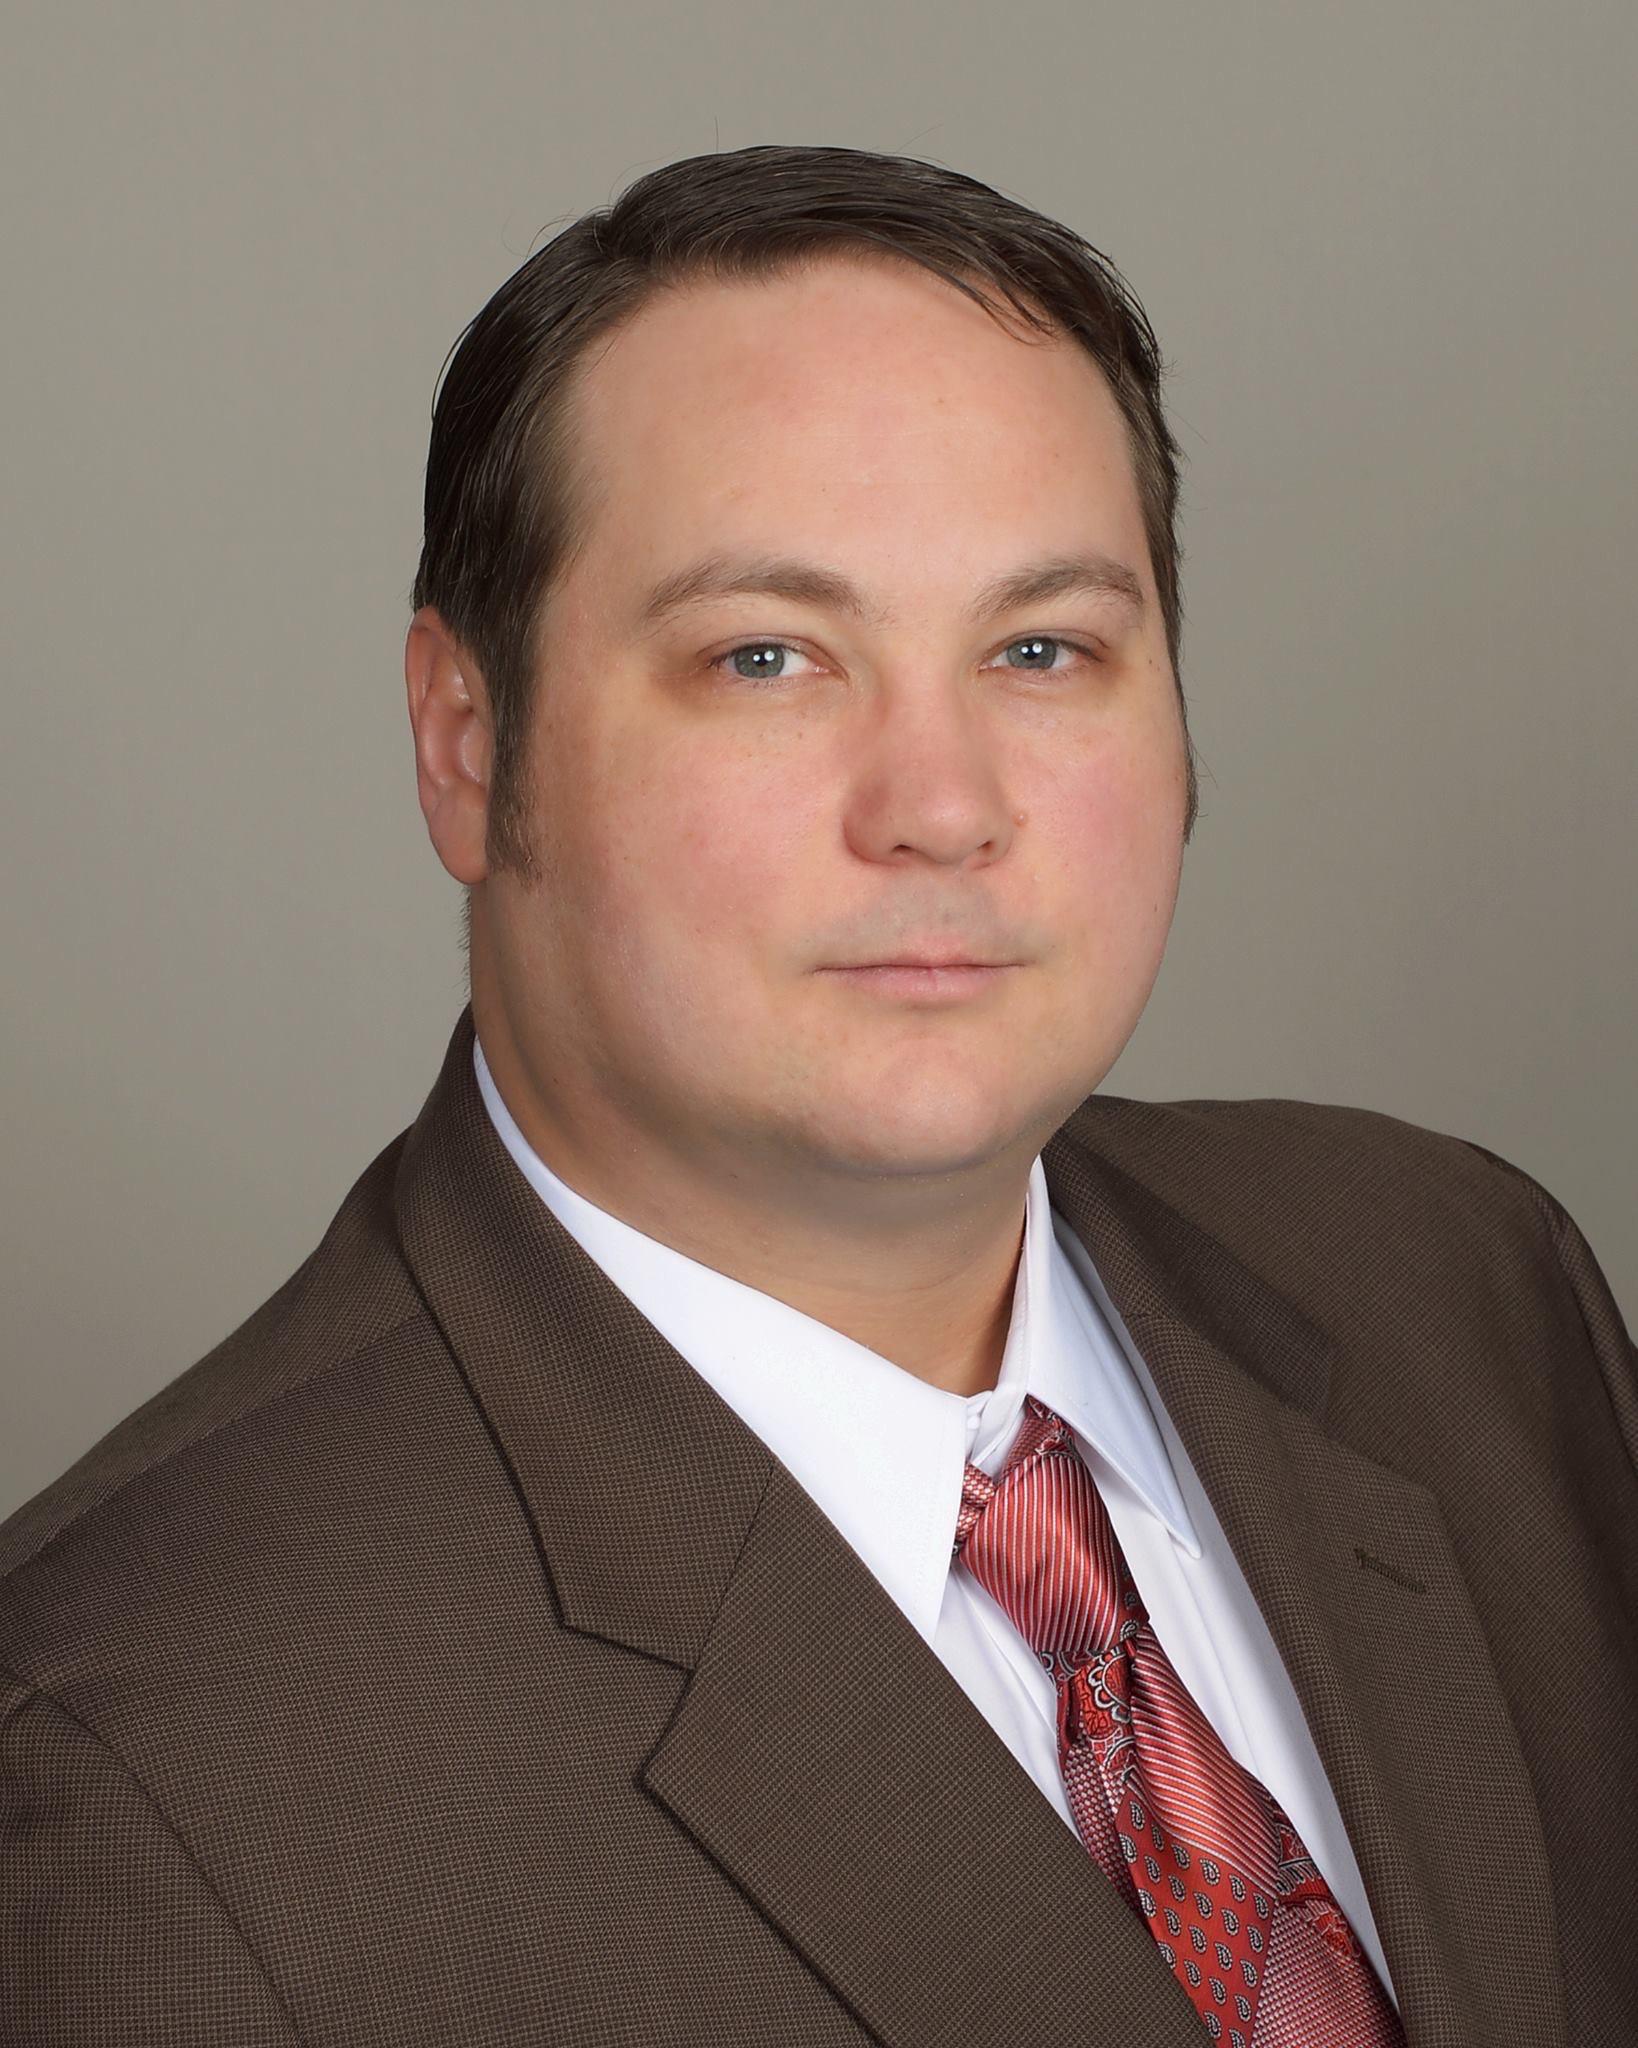 Sam Snyder, Attorney at Law